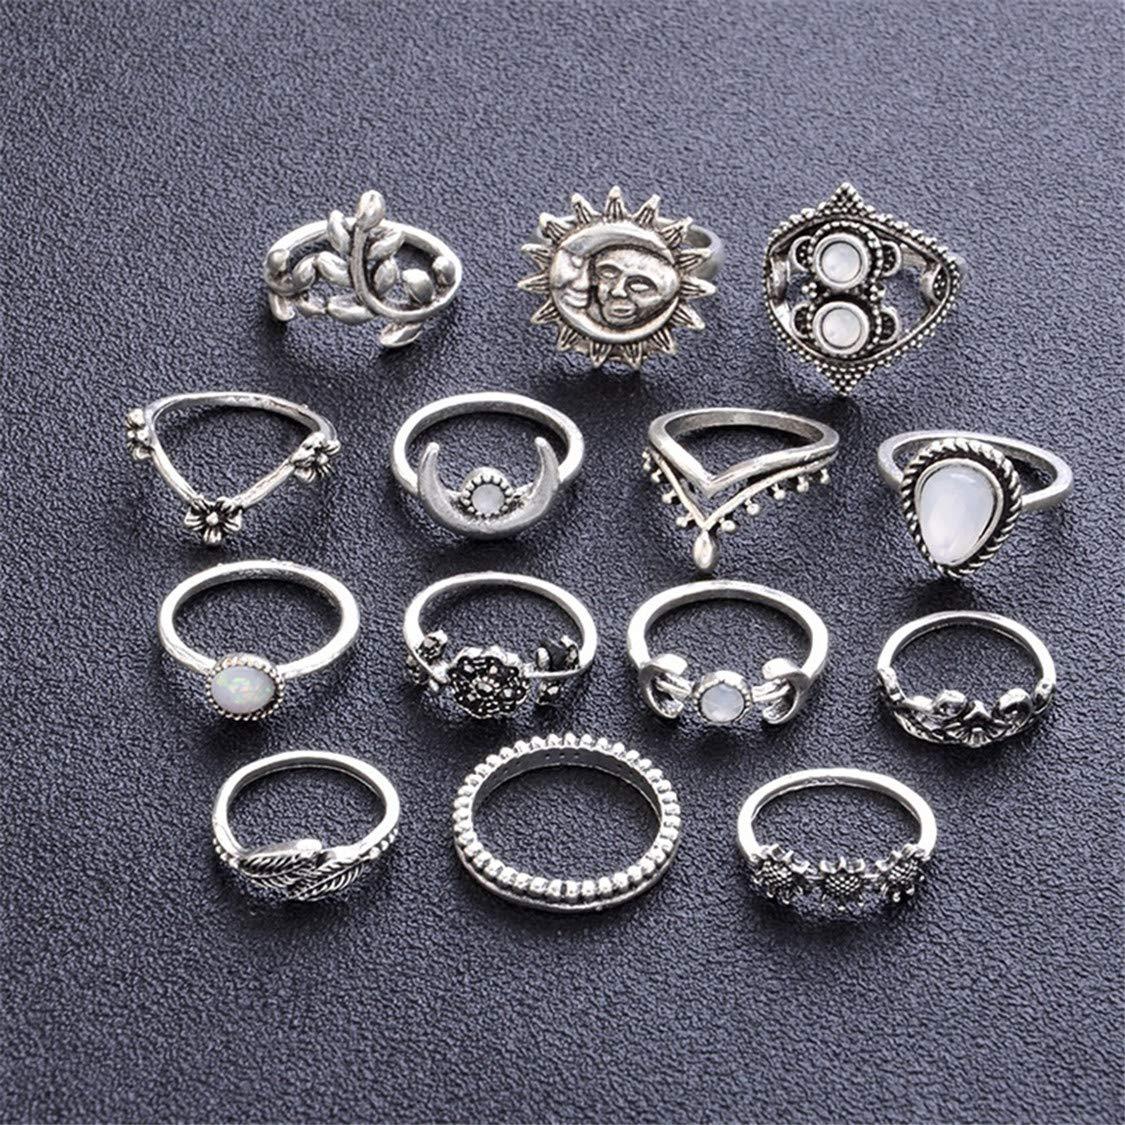 Idiytip 14Pcs Sterling Silver Sunflower Moon Sun Fourteen Rings Hollow Engraved Drops Rhinestone Knuckle Rings Set Mid Rings